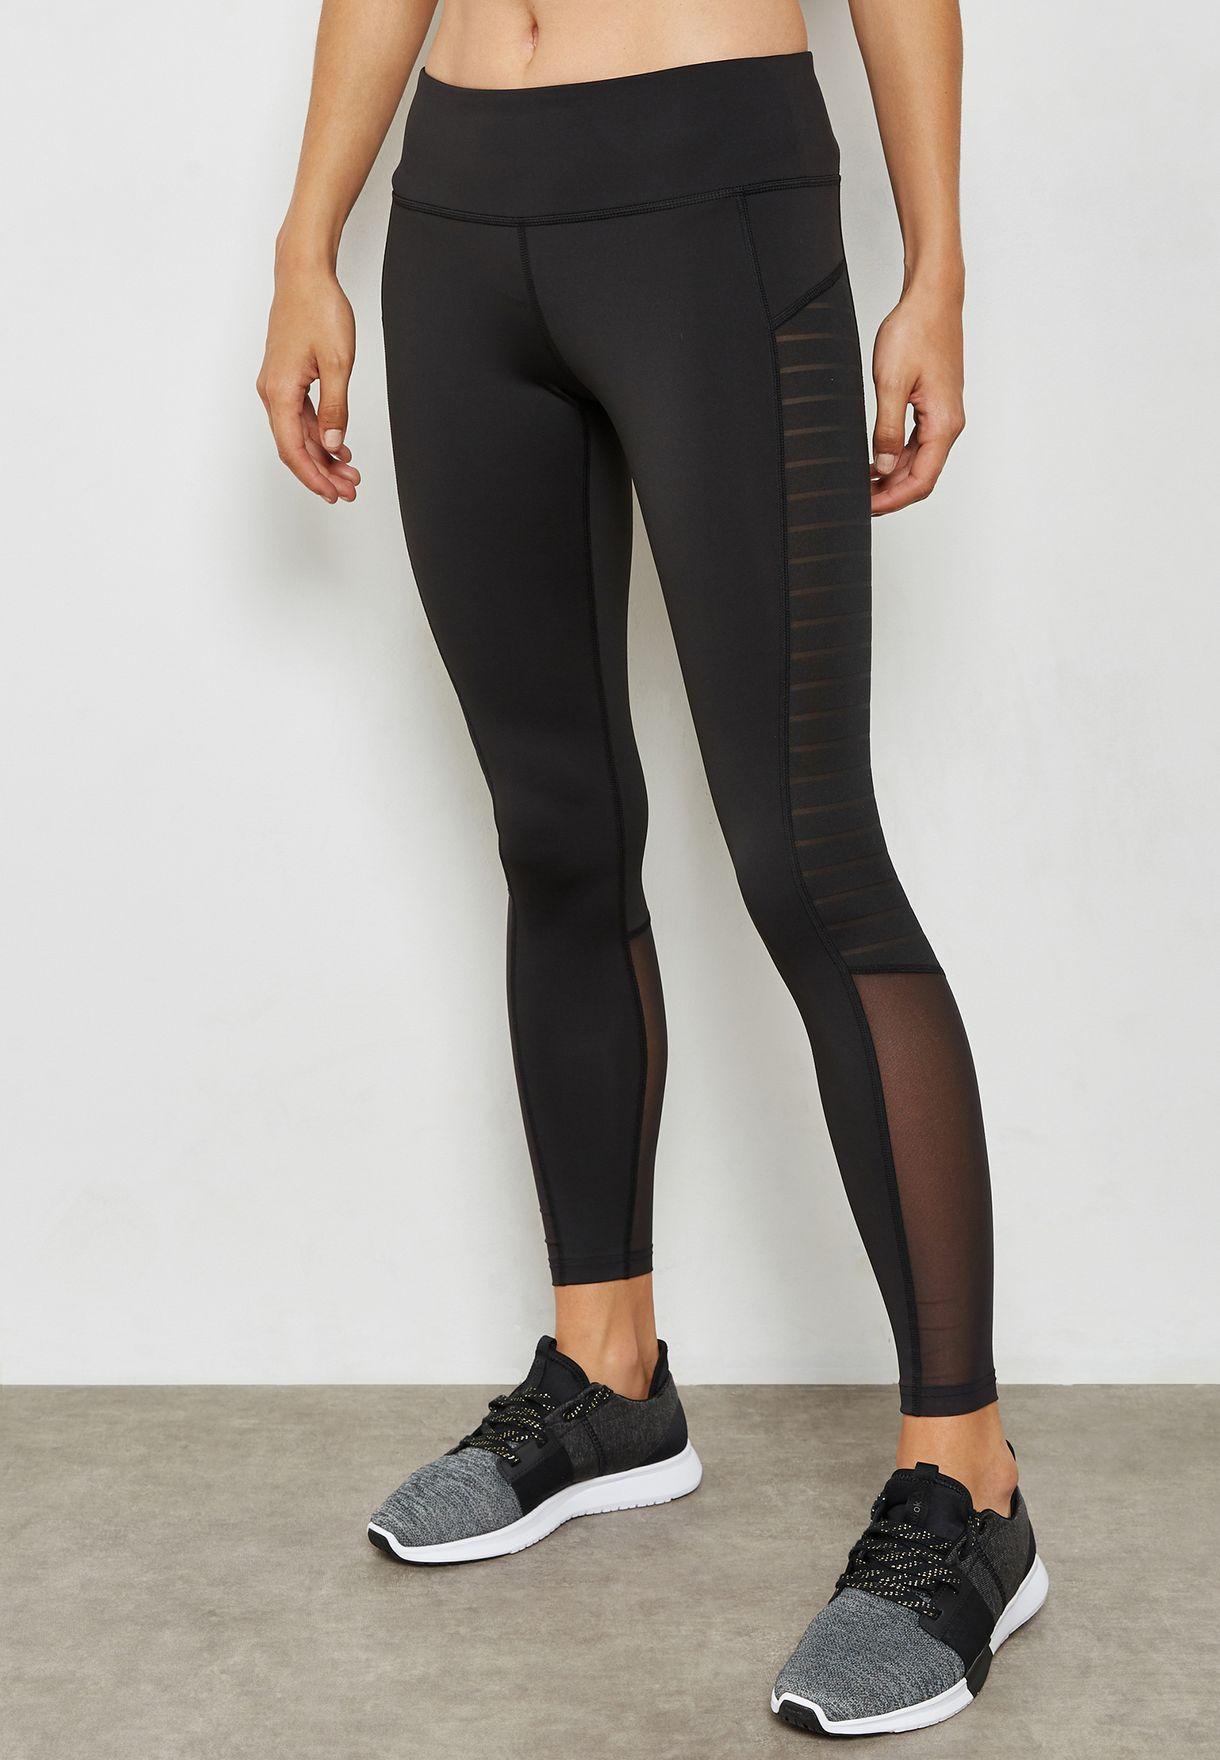 96aedd7f3b436 Shop Reebok black Mesh Leggings CD7676 for Women in UAE - RE019AT32KDJ